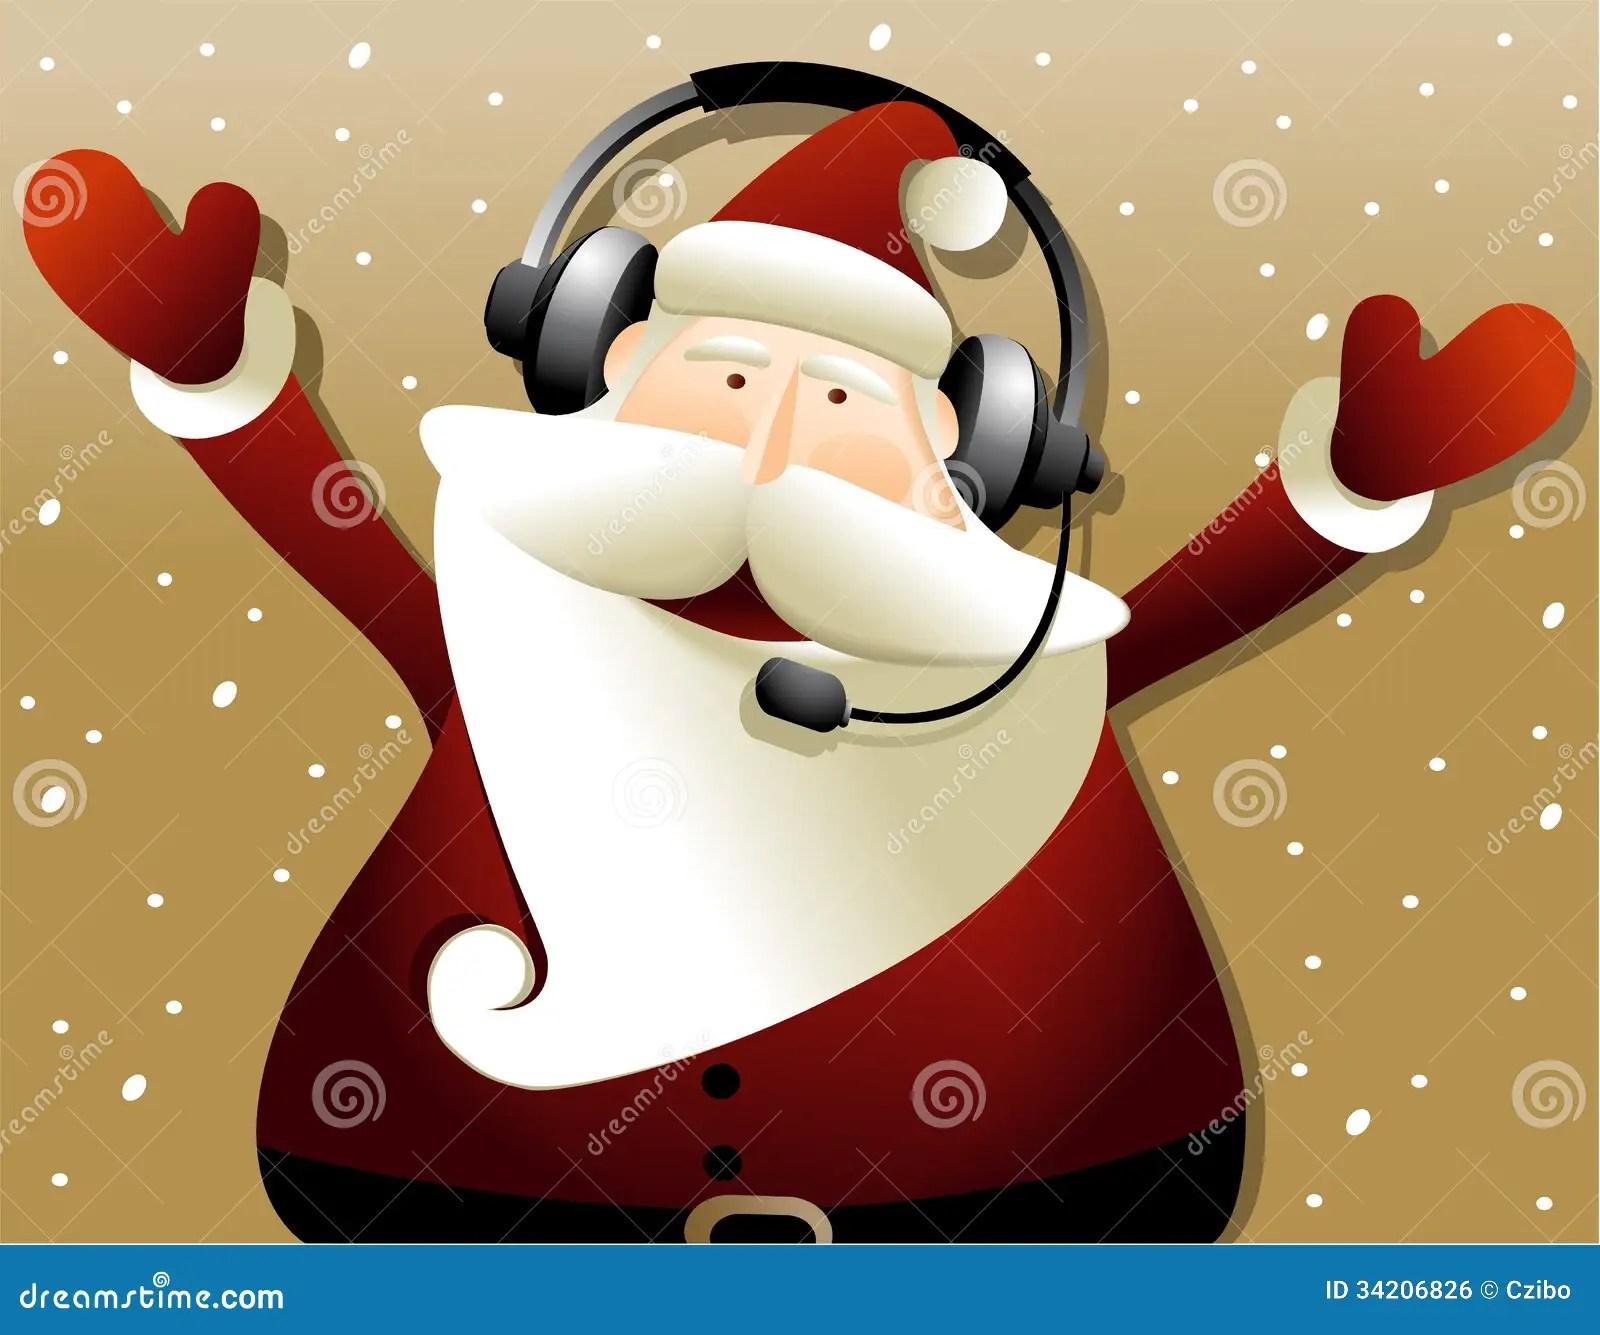 Santa Claus Royalty Free Stock Image Image 34206826